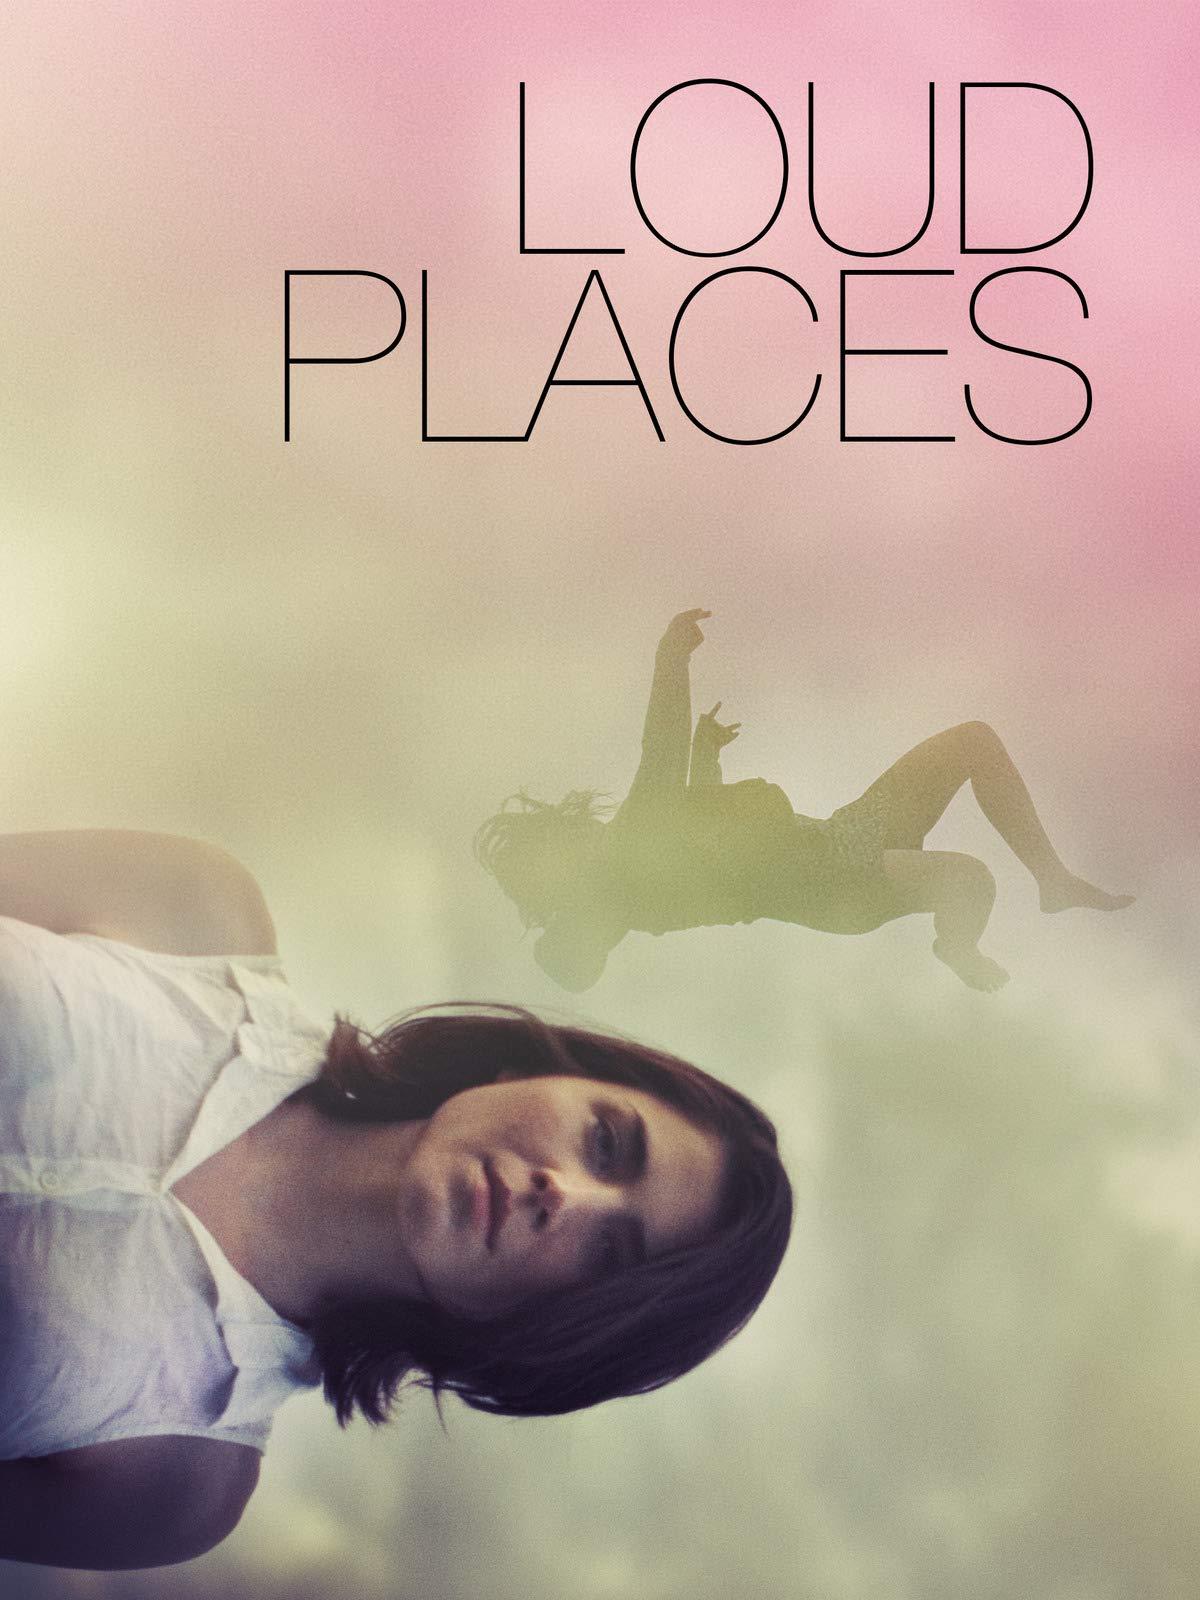 Loud Places on Amazon Prime Video UK